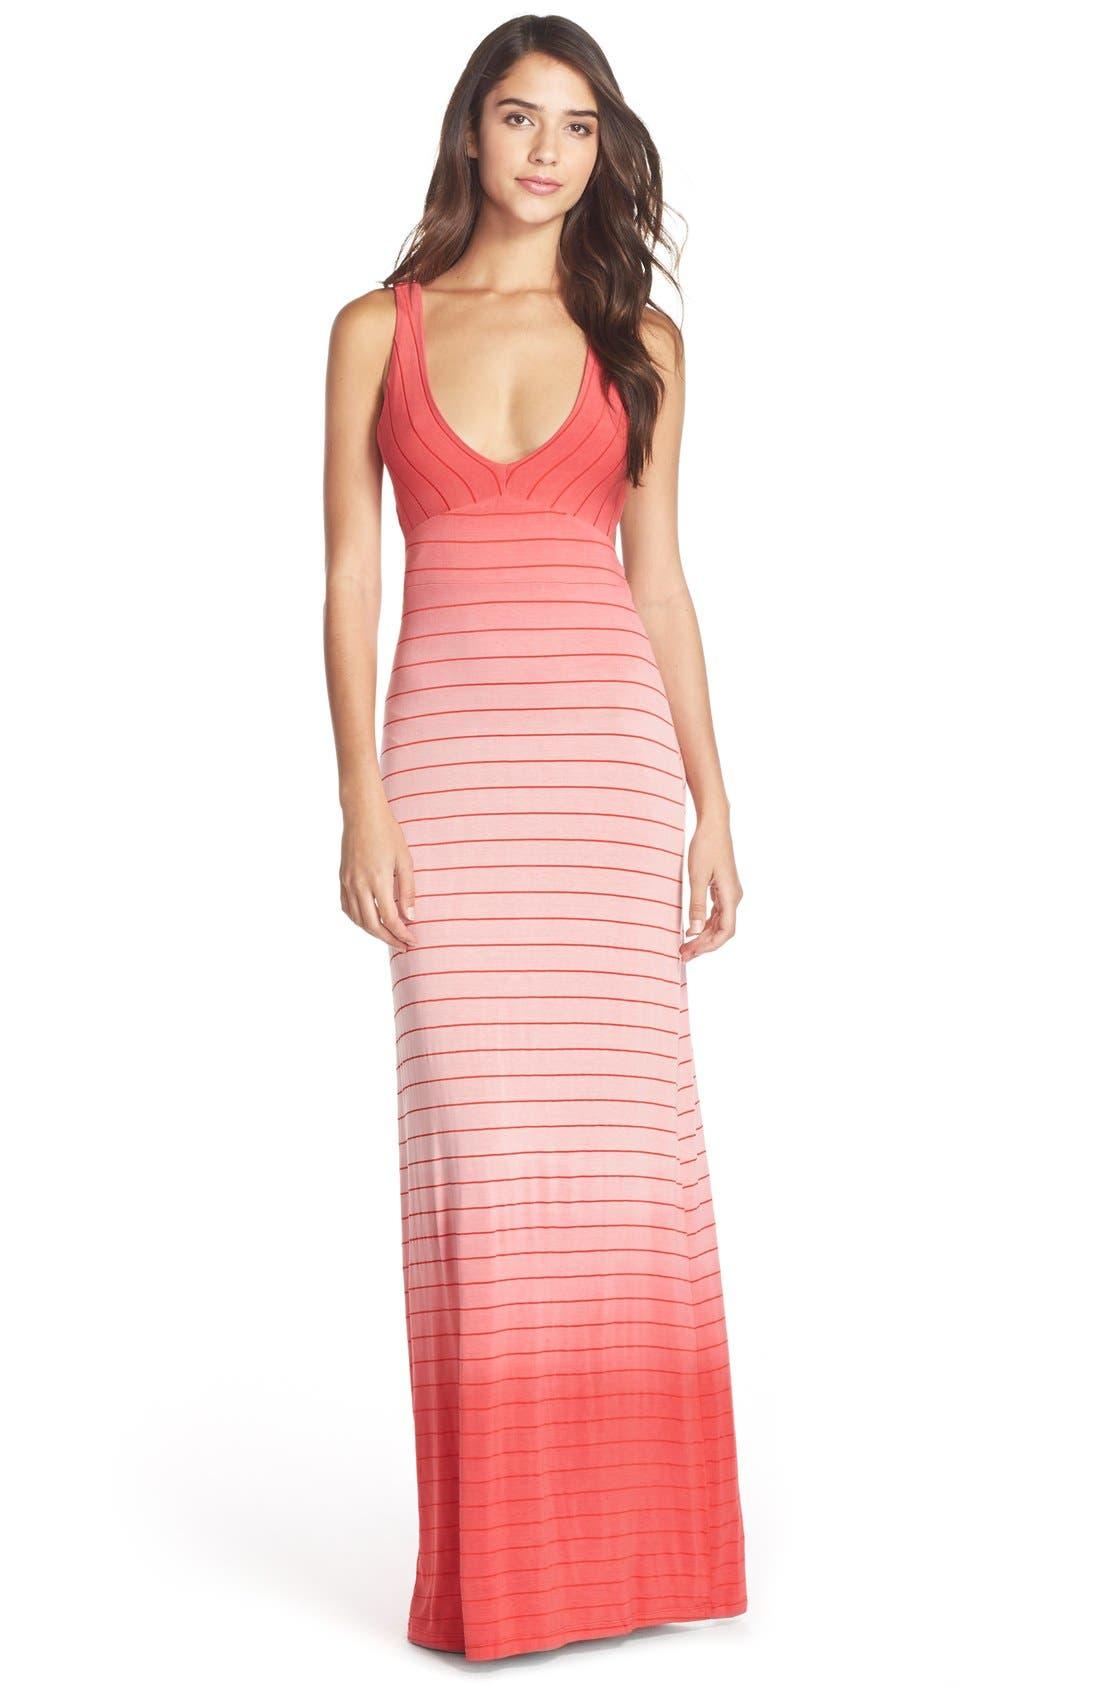 Main Image - Fraiche by J Ombré Tie Dye Jersey Maxi Dress